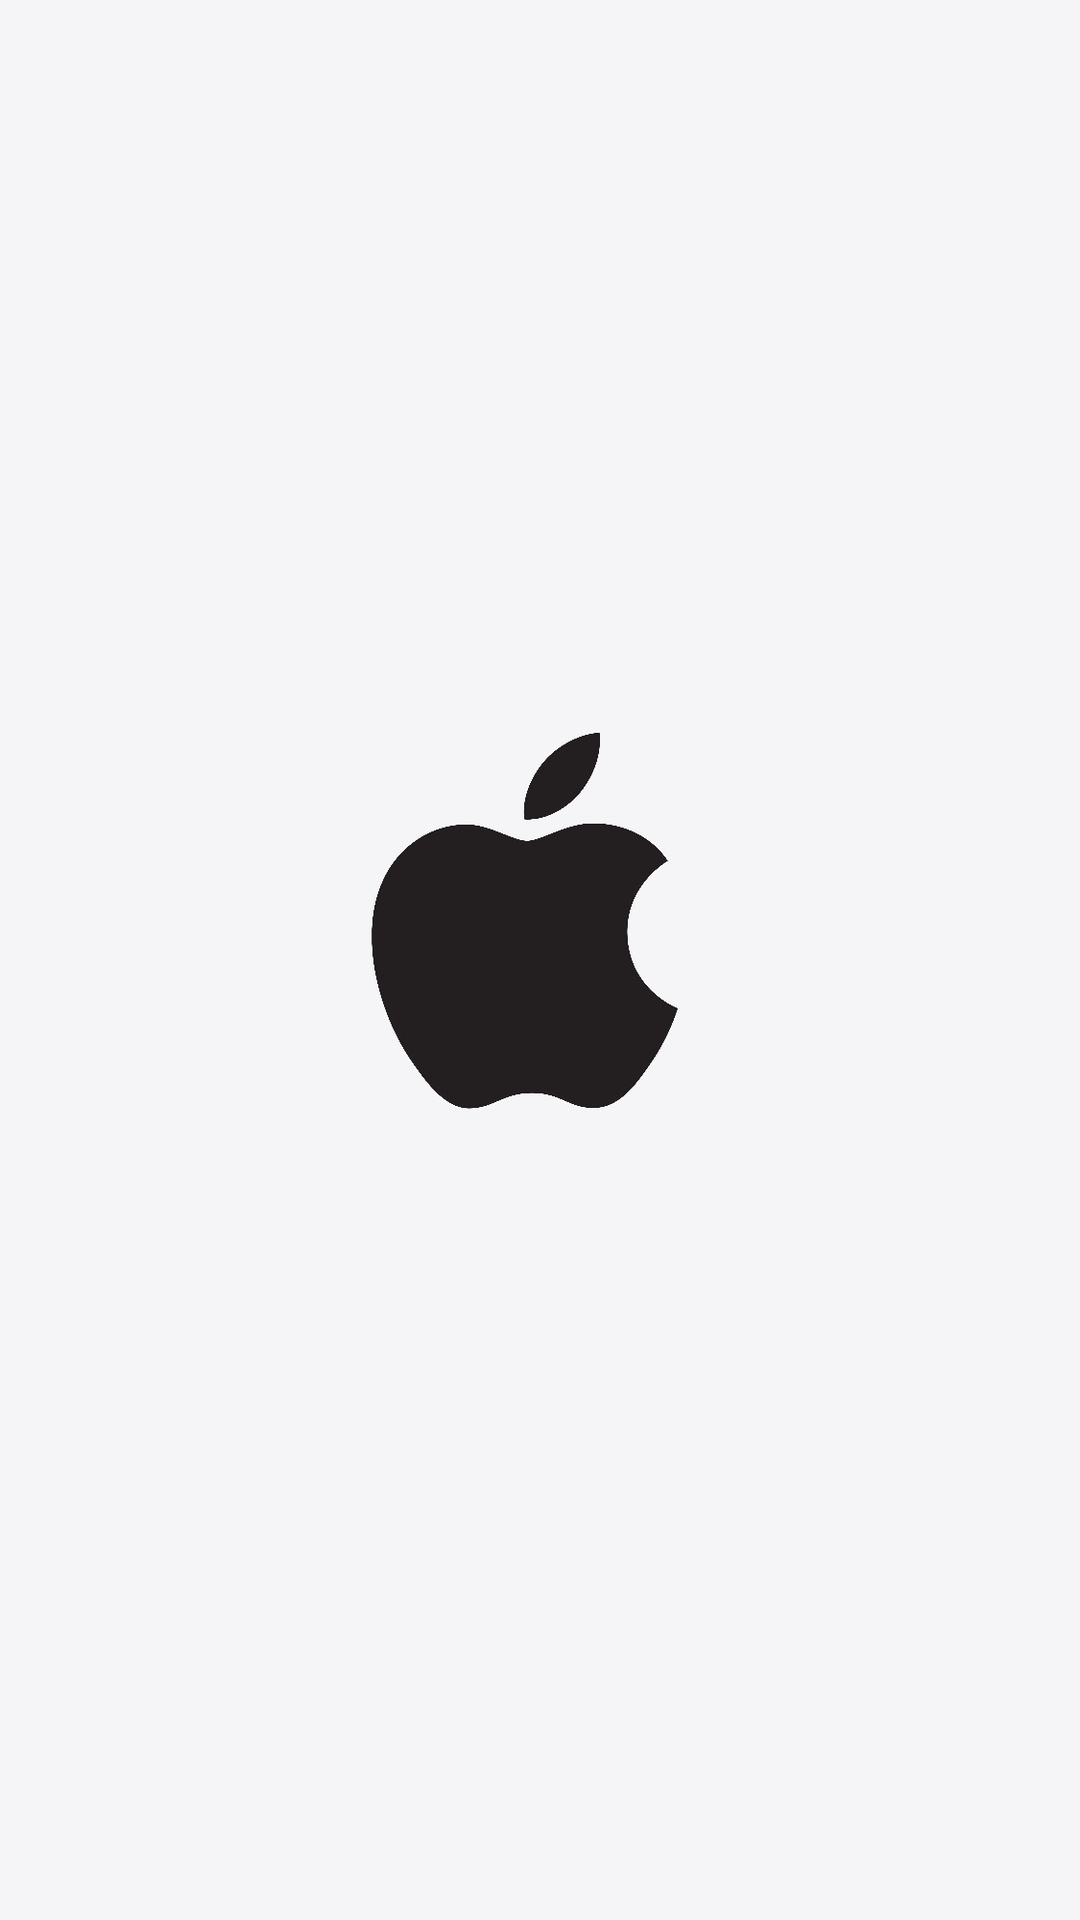 iphone 5c wallpapers hd خلفيات ايفون أيفون